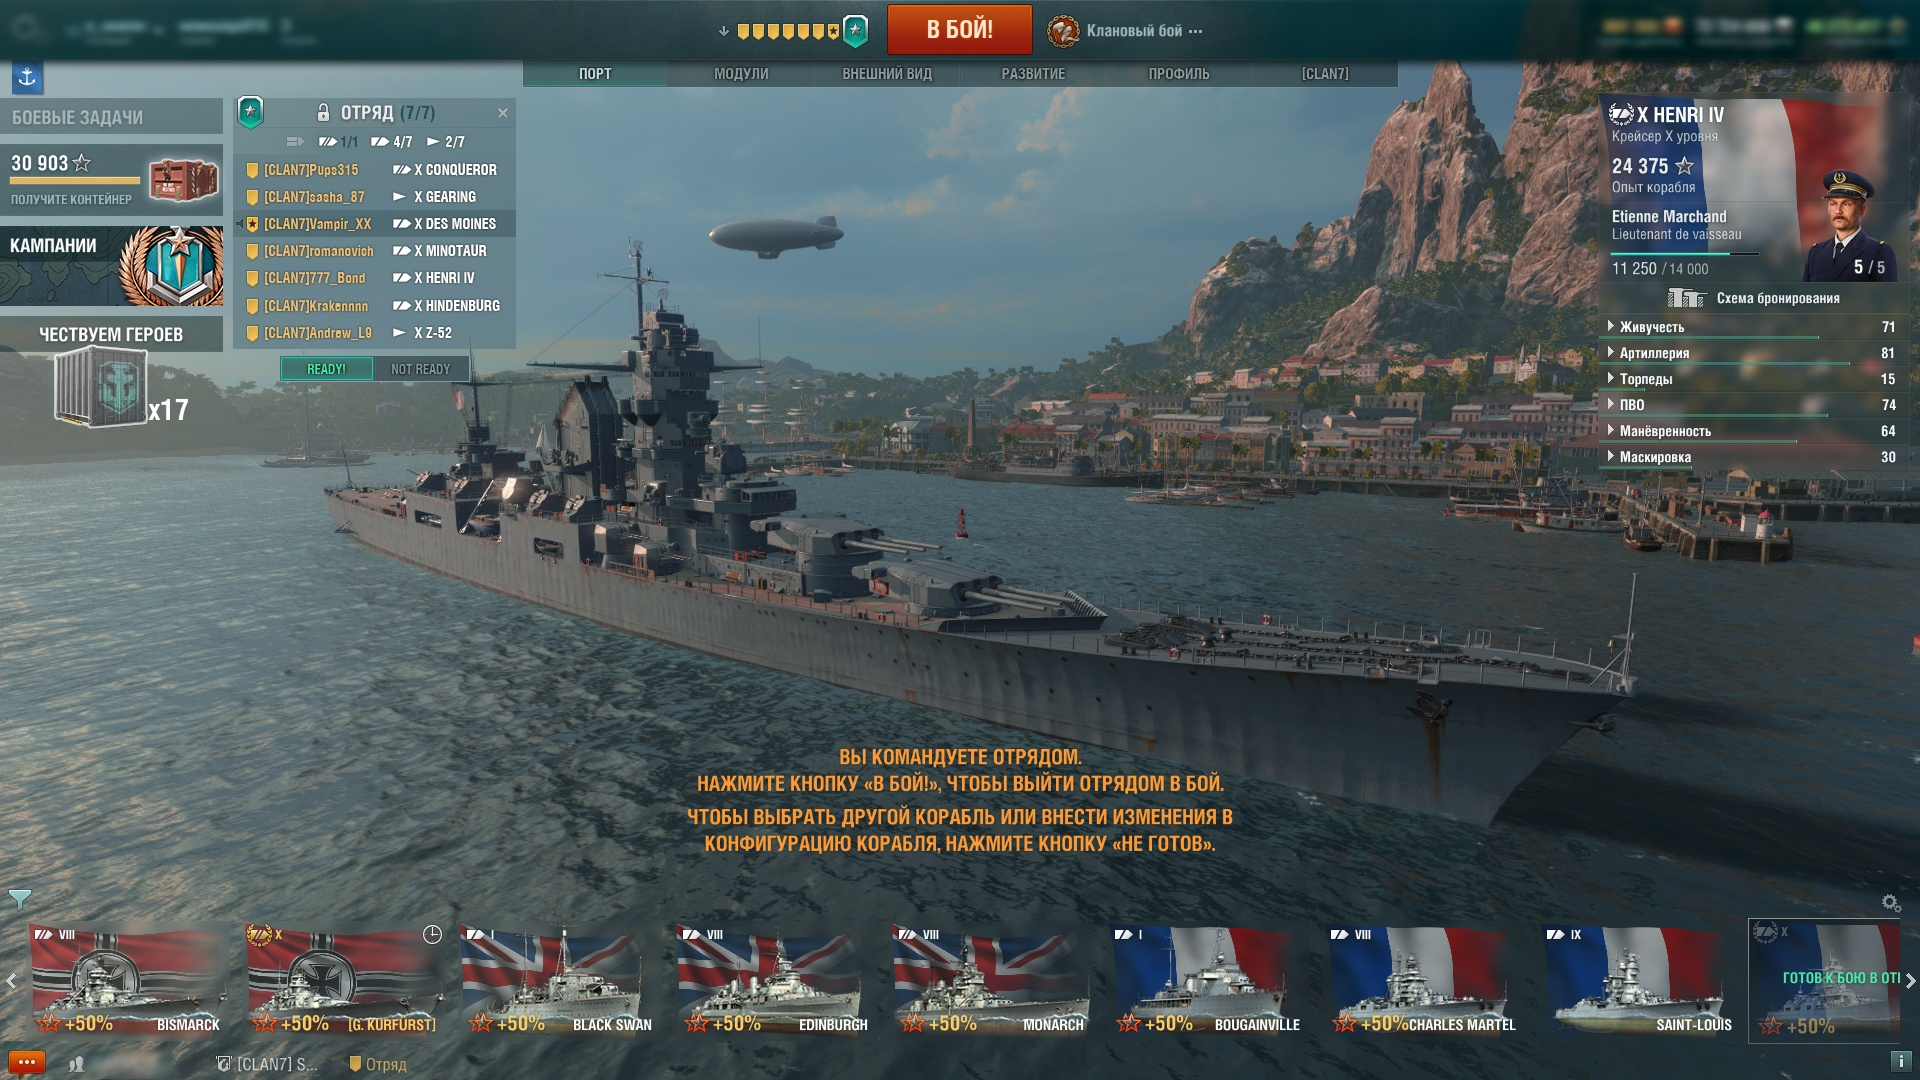 Обои wg, wargaming net, wows, мир кораблей, шторм. Игры foto 6